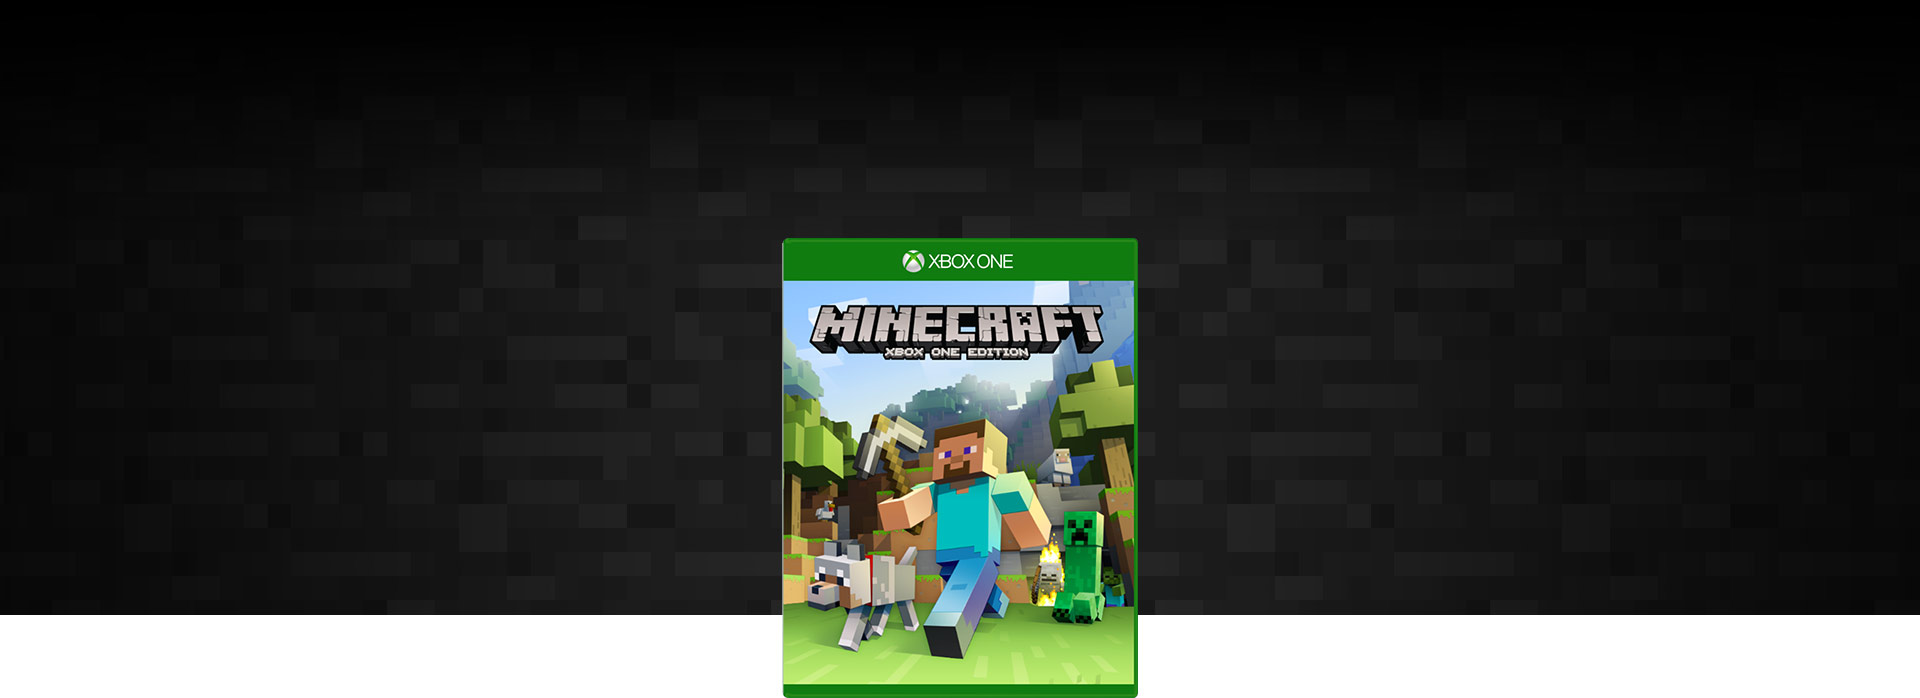 Minecraft boxshot